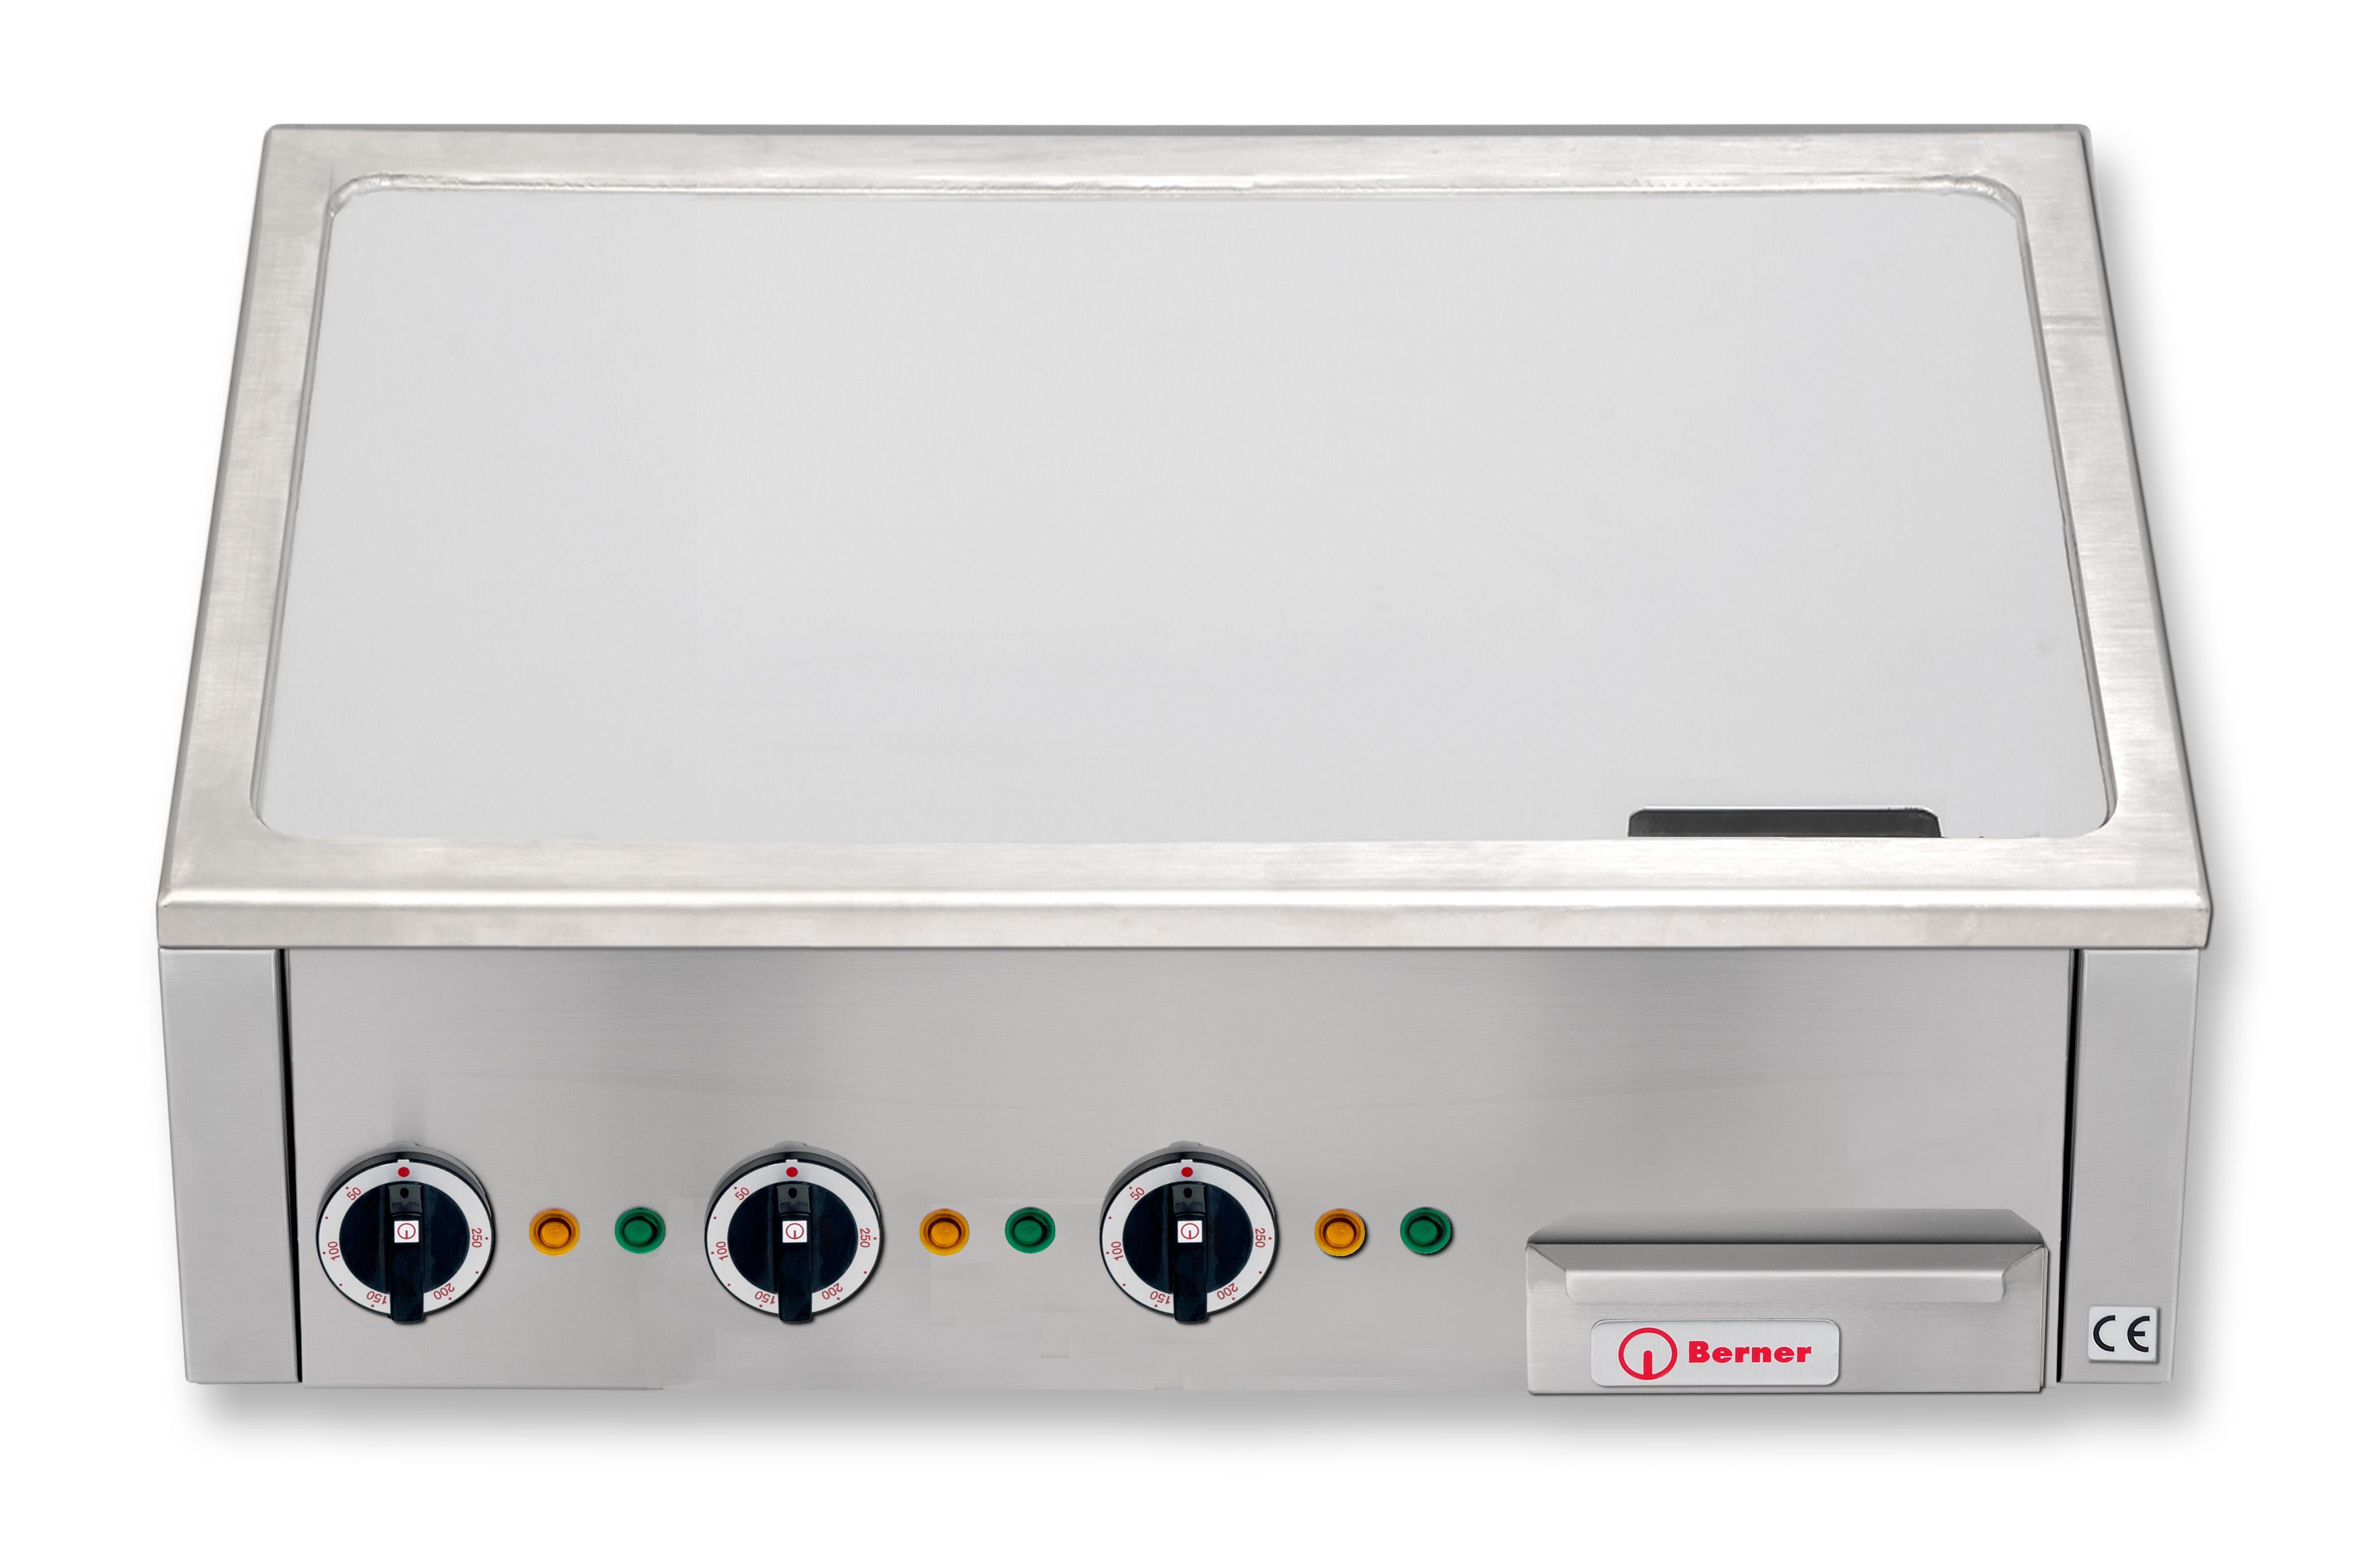 Berner Bgax140c Asia Teppanyaki Grillplatte Alle Produkte Berner